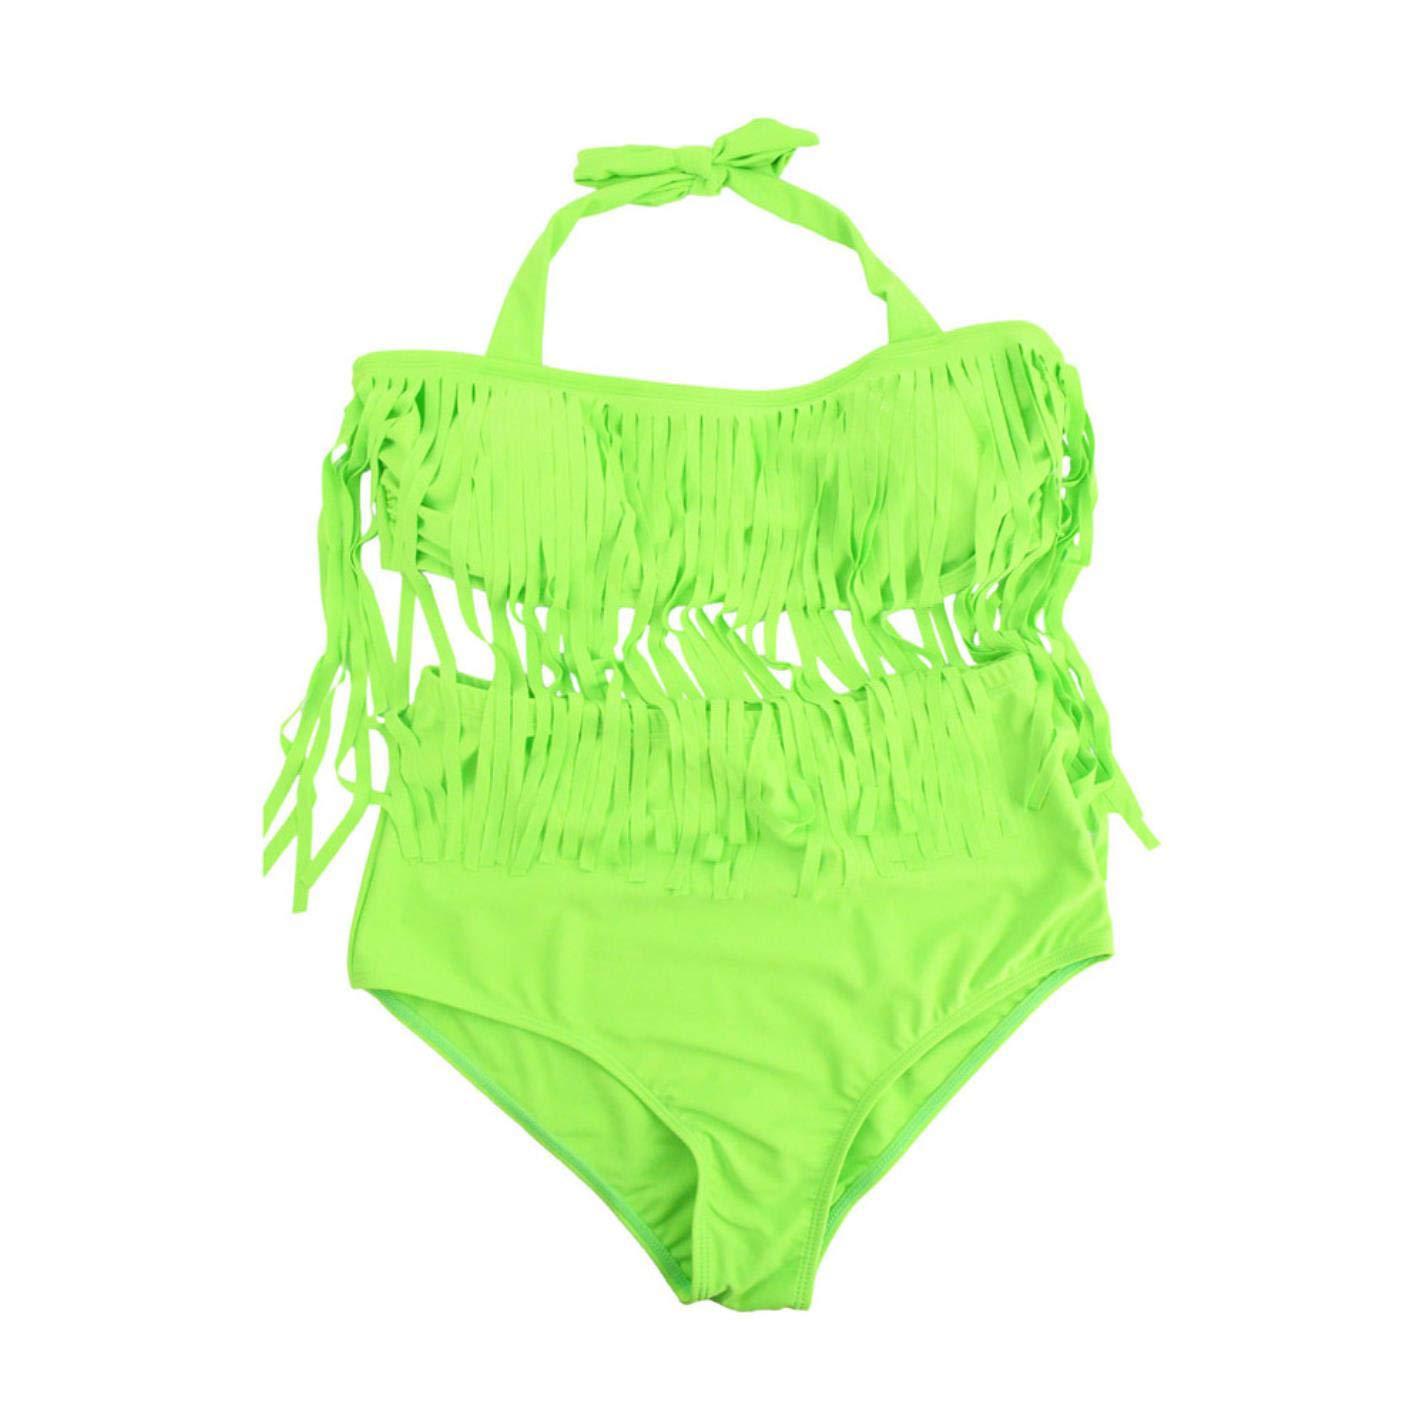 QVKis Women Plus Size Tassel Tie at Neck High Waist Push up Swimwear